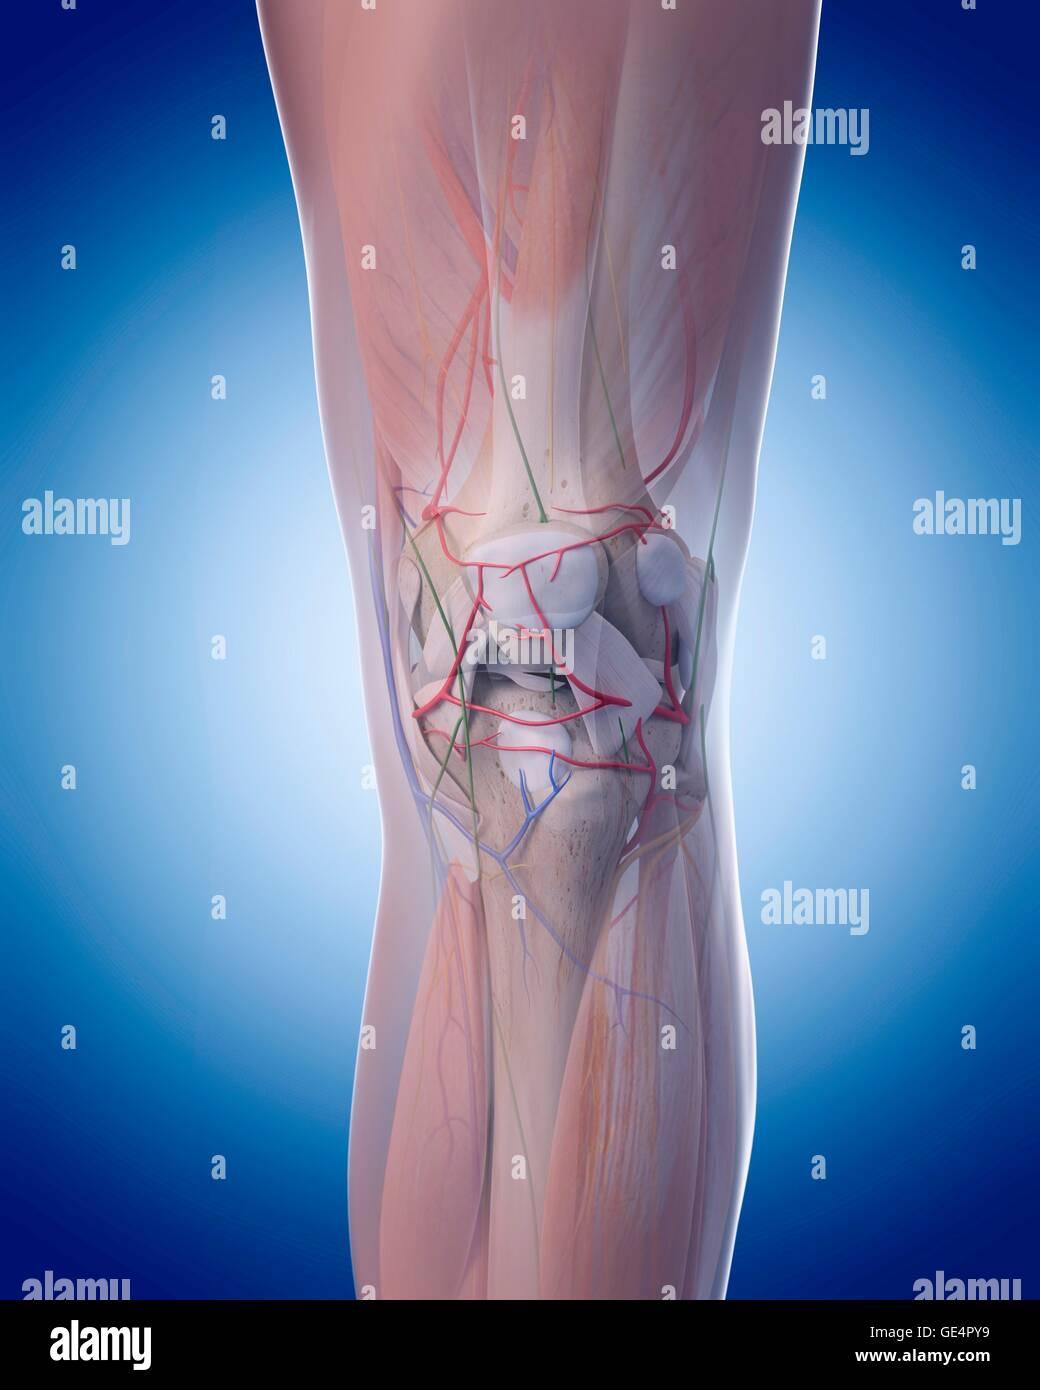 Human Knee Anatomy Illustration Stock Photo 111973213 Alamy